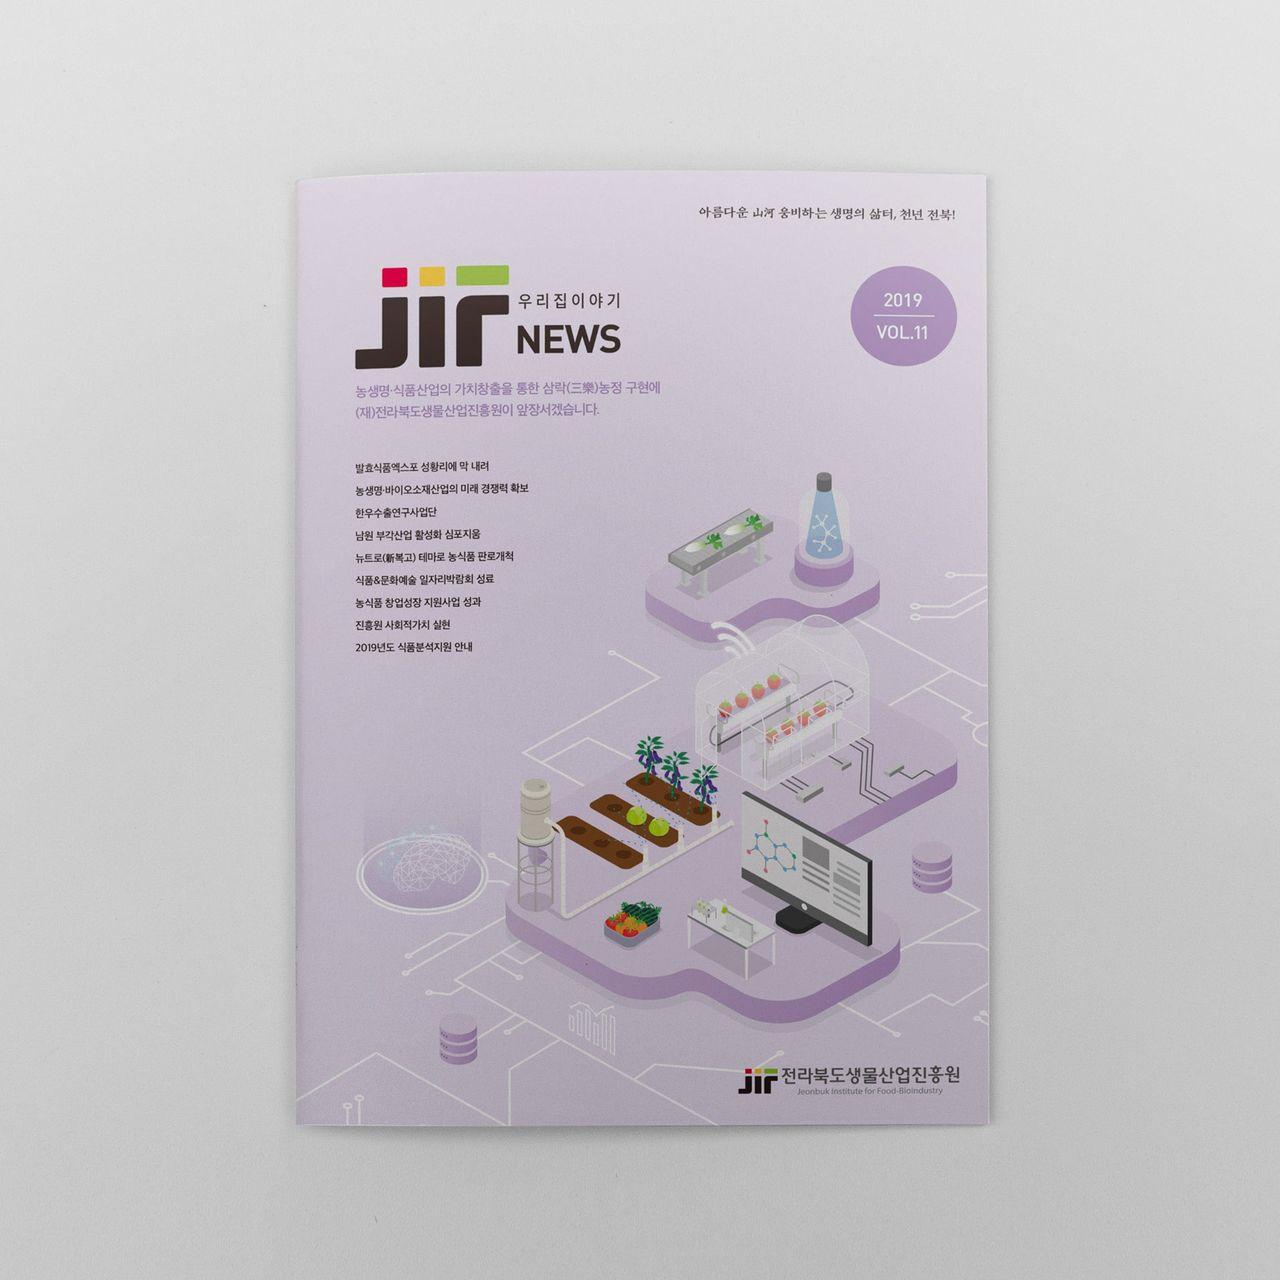 JIR 뉴스 : 우리집이야기 매거진 간행물 디자인 시안 - 전라북도생물산업진흥원